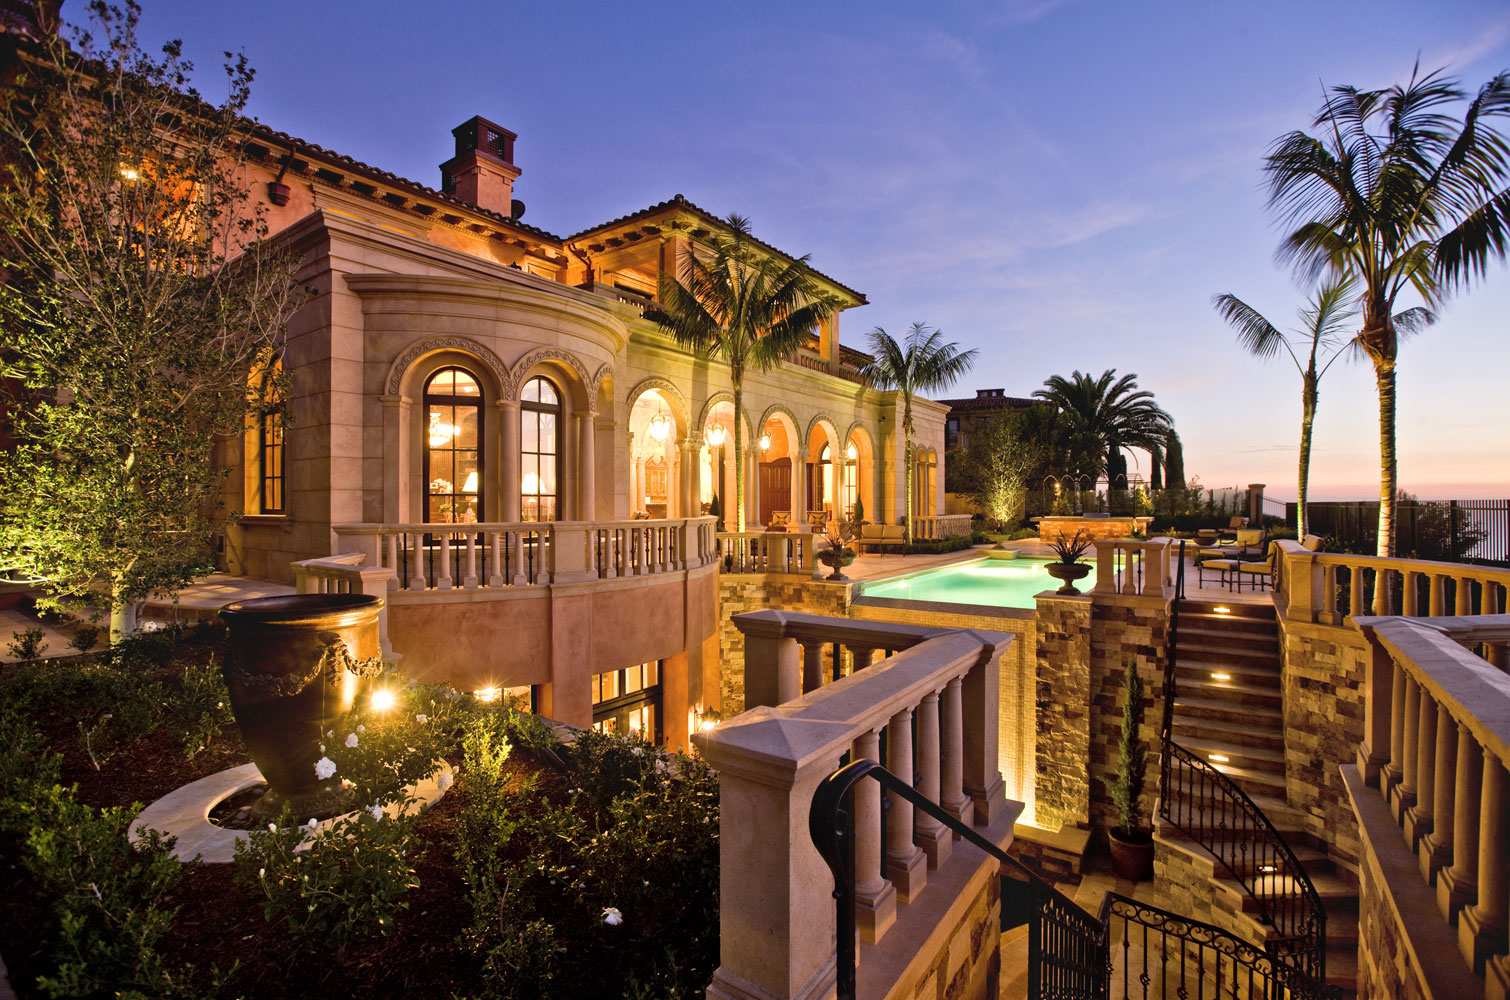 Contemporary-Italianate-Rear-Exterior-Columns-Archways-Pool-Corbin-Reeves.jpg